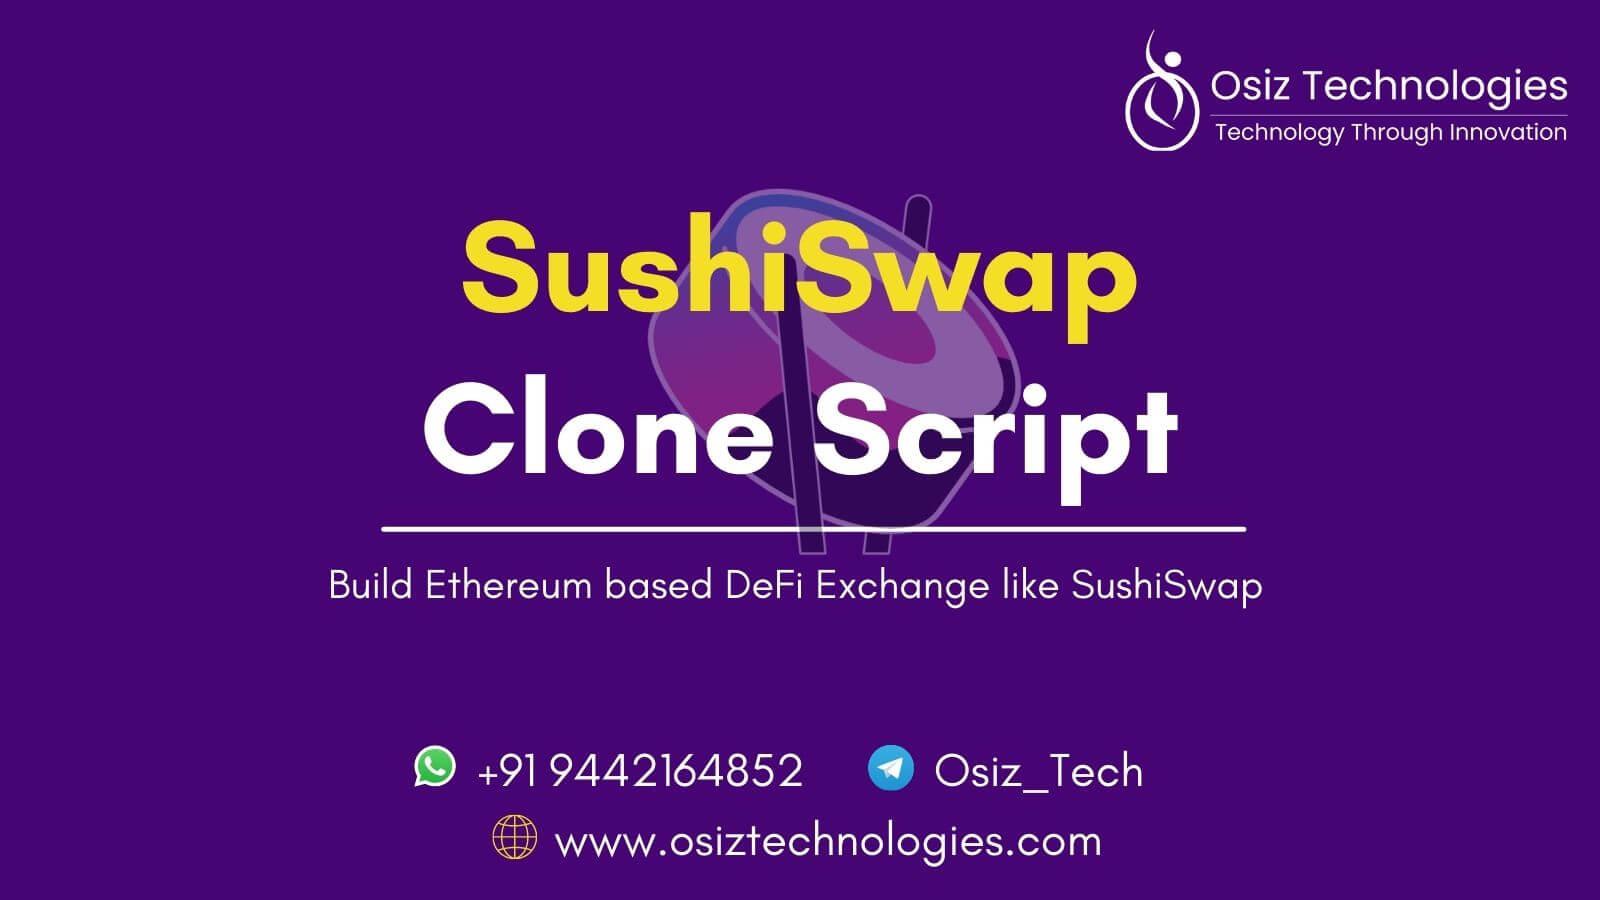 Sushiswap Clone Script - Build Ethereum based DeFi Exchange like SushiSwap